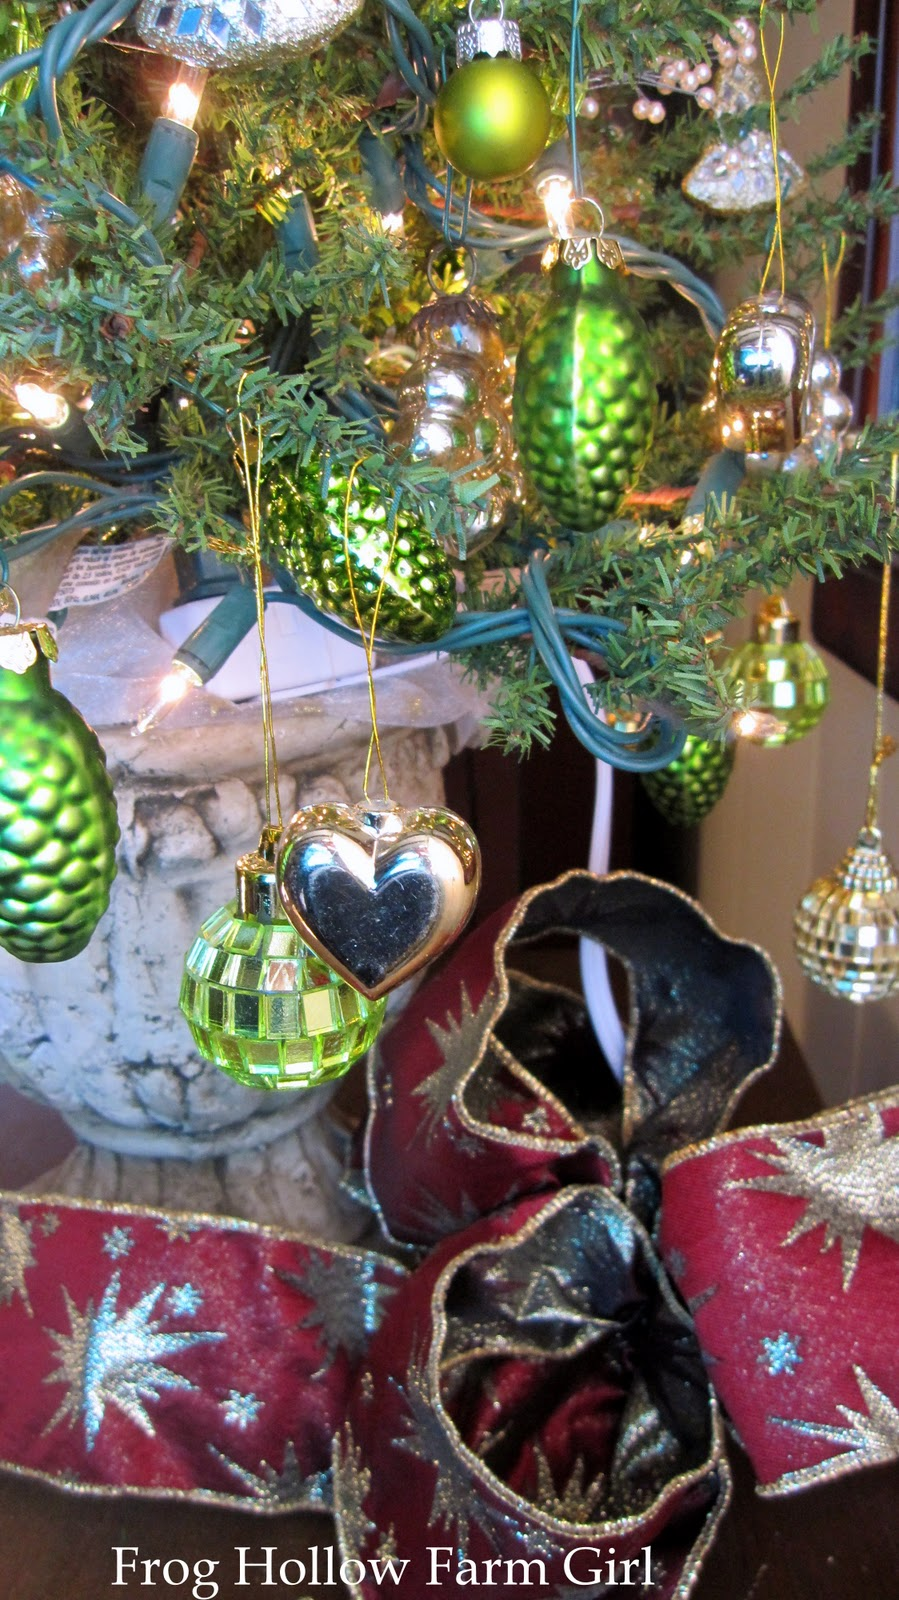 Frog Hollow Farm Girl My Irish Christmas Tree At Frog